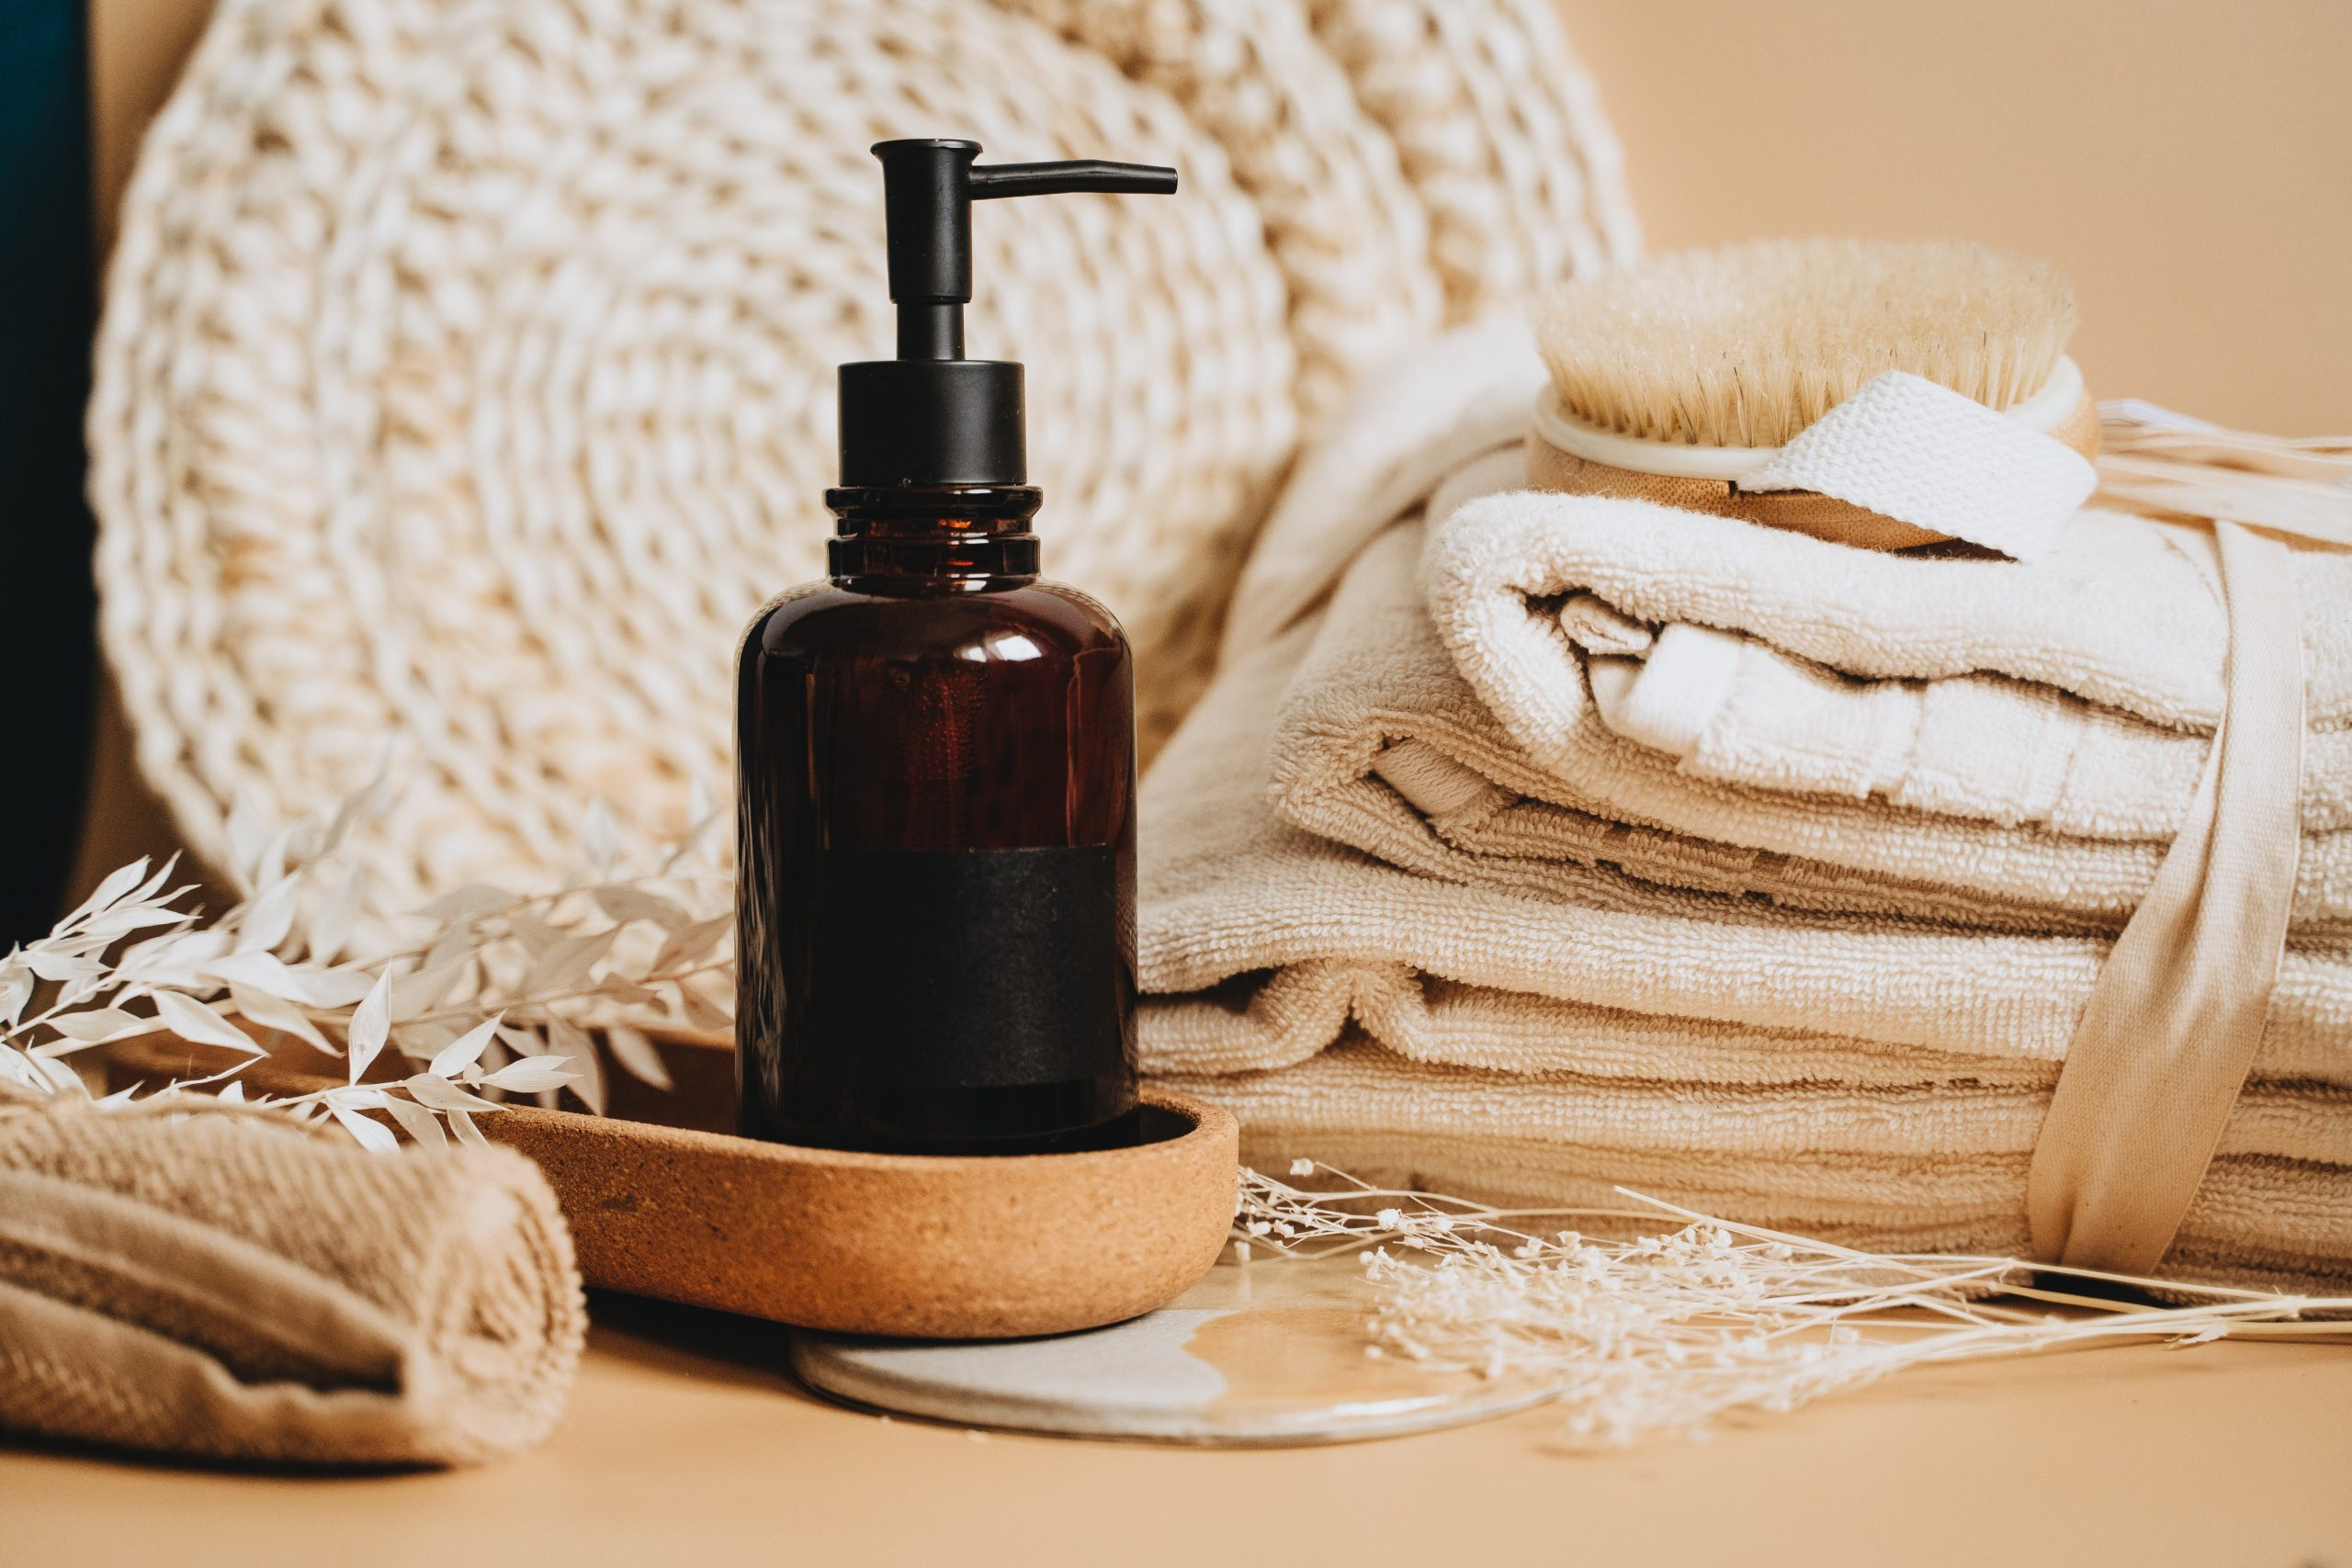 Nega kože uz pomoć ulja za telo